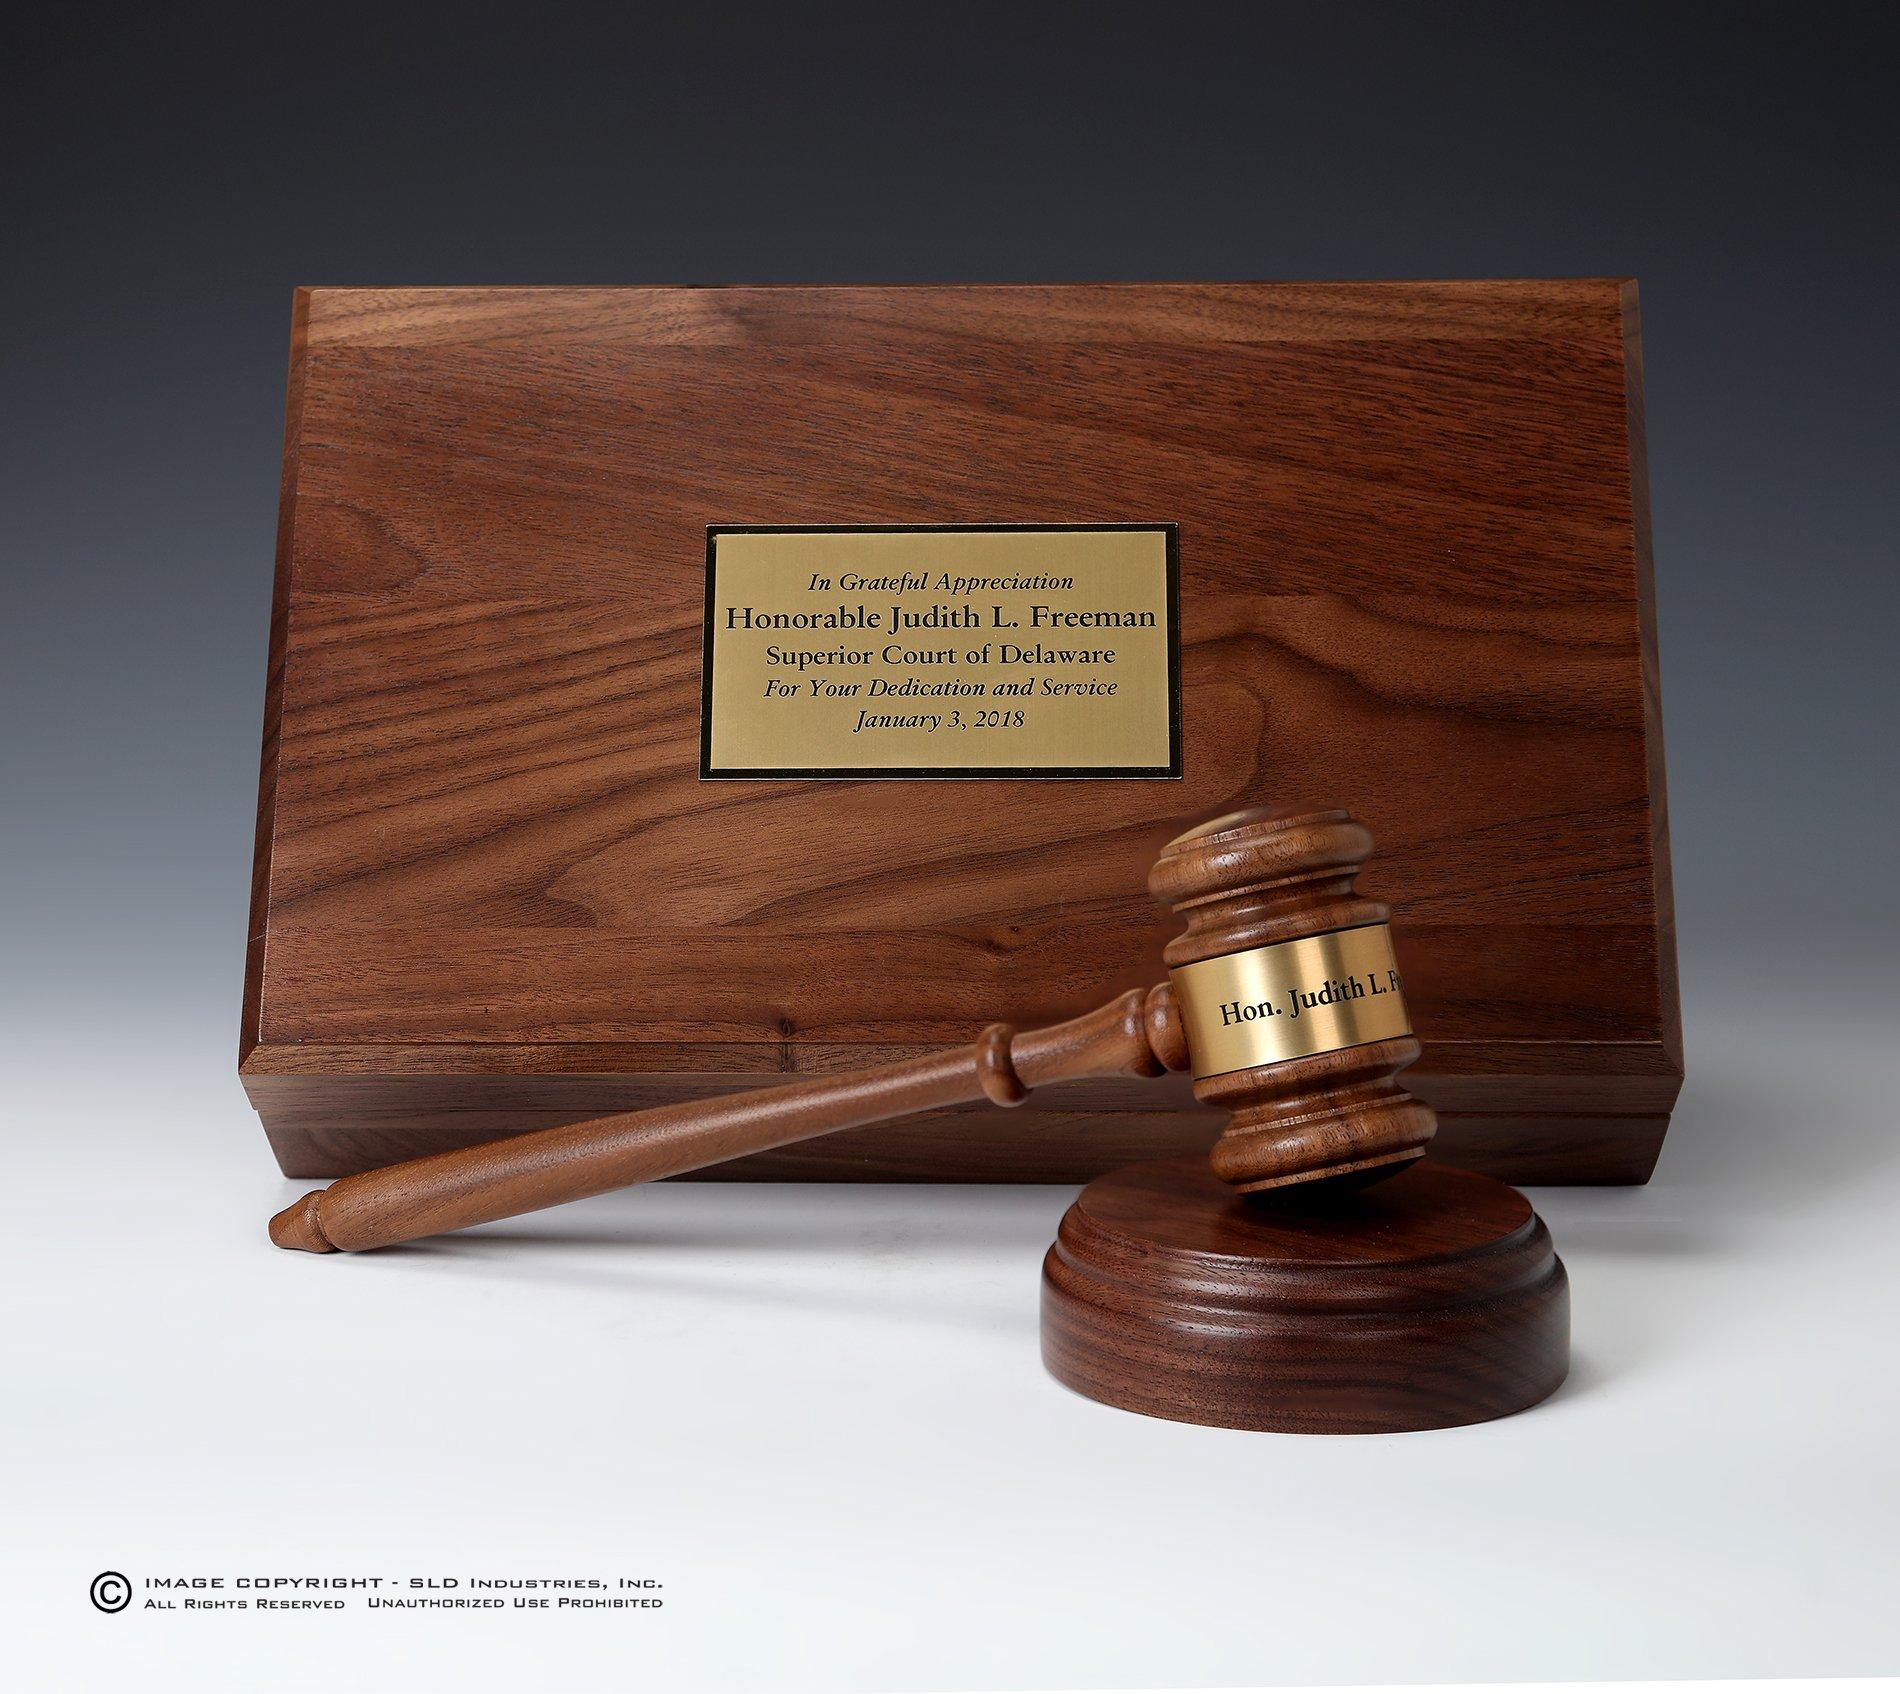 Personalized Engraved Gavel Set SOLID WALNUT Gift Box, 10'' Gavel and 4'' Sounding Block, Lawyer Gift, Judge Gift, Mayor Gift